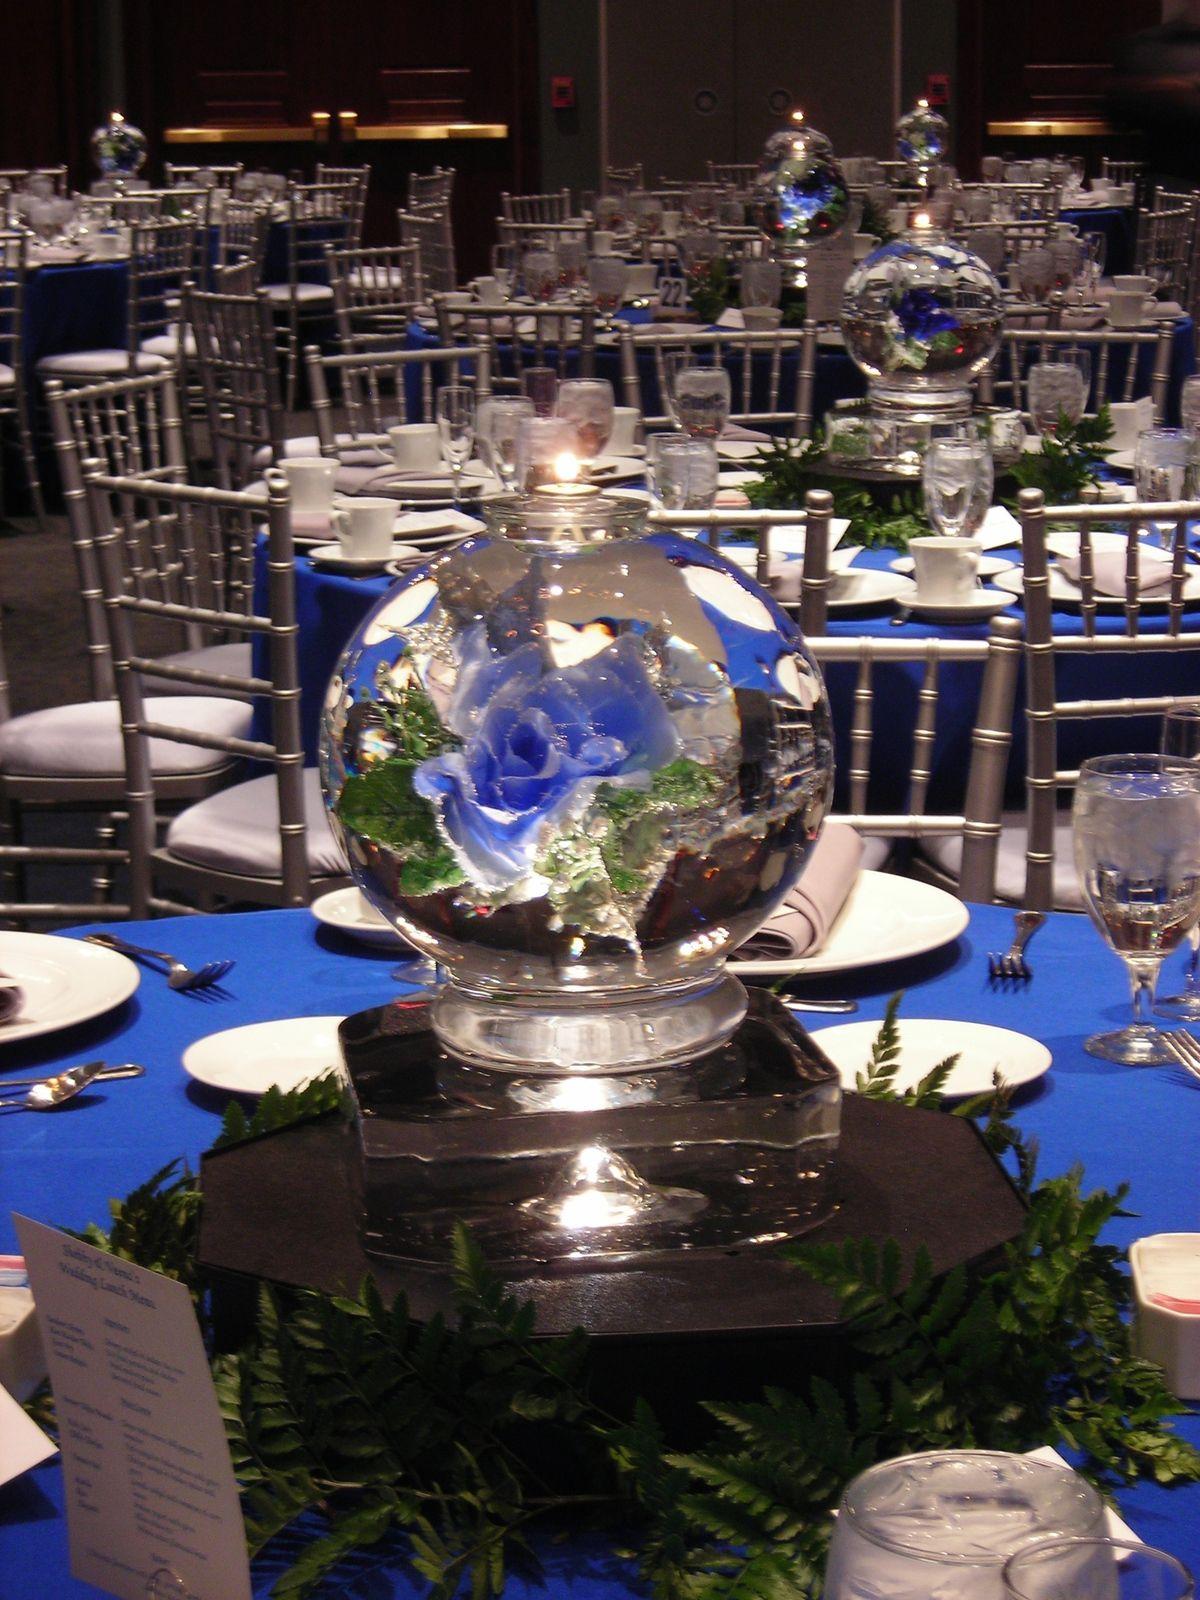 Sphere centerpiece w blue flowers ice sculpture table